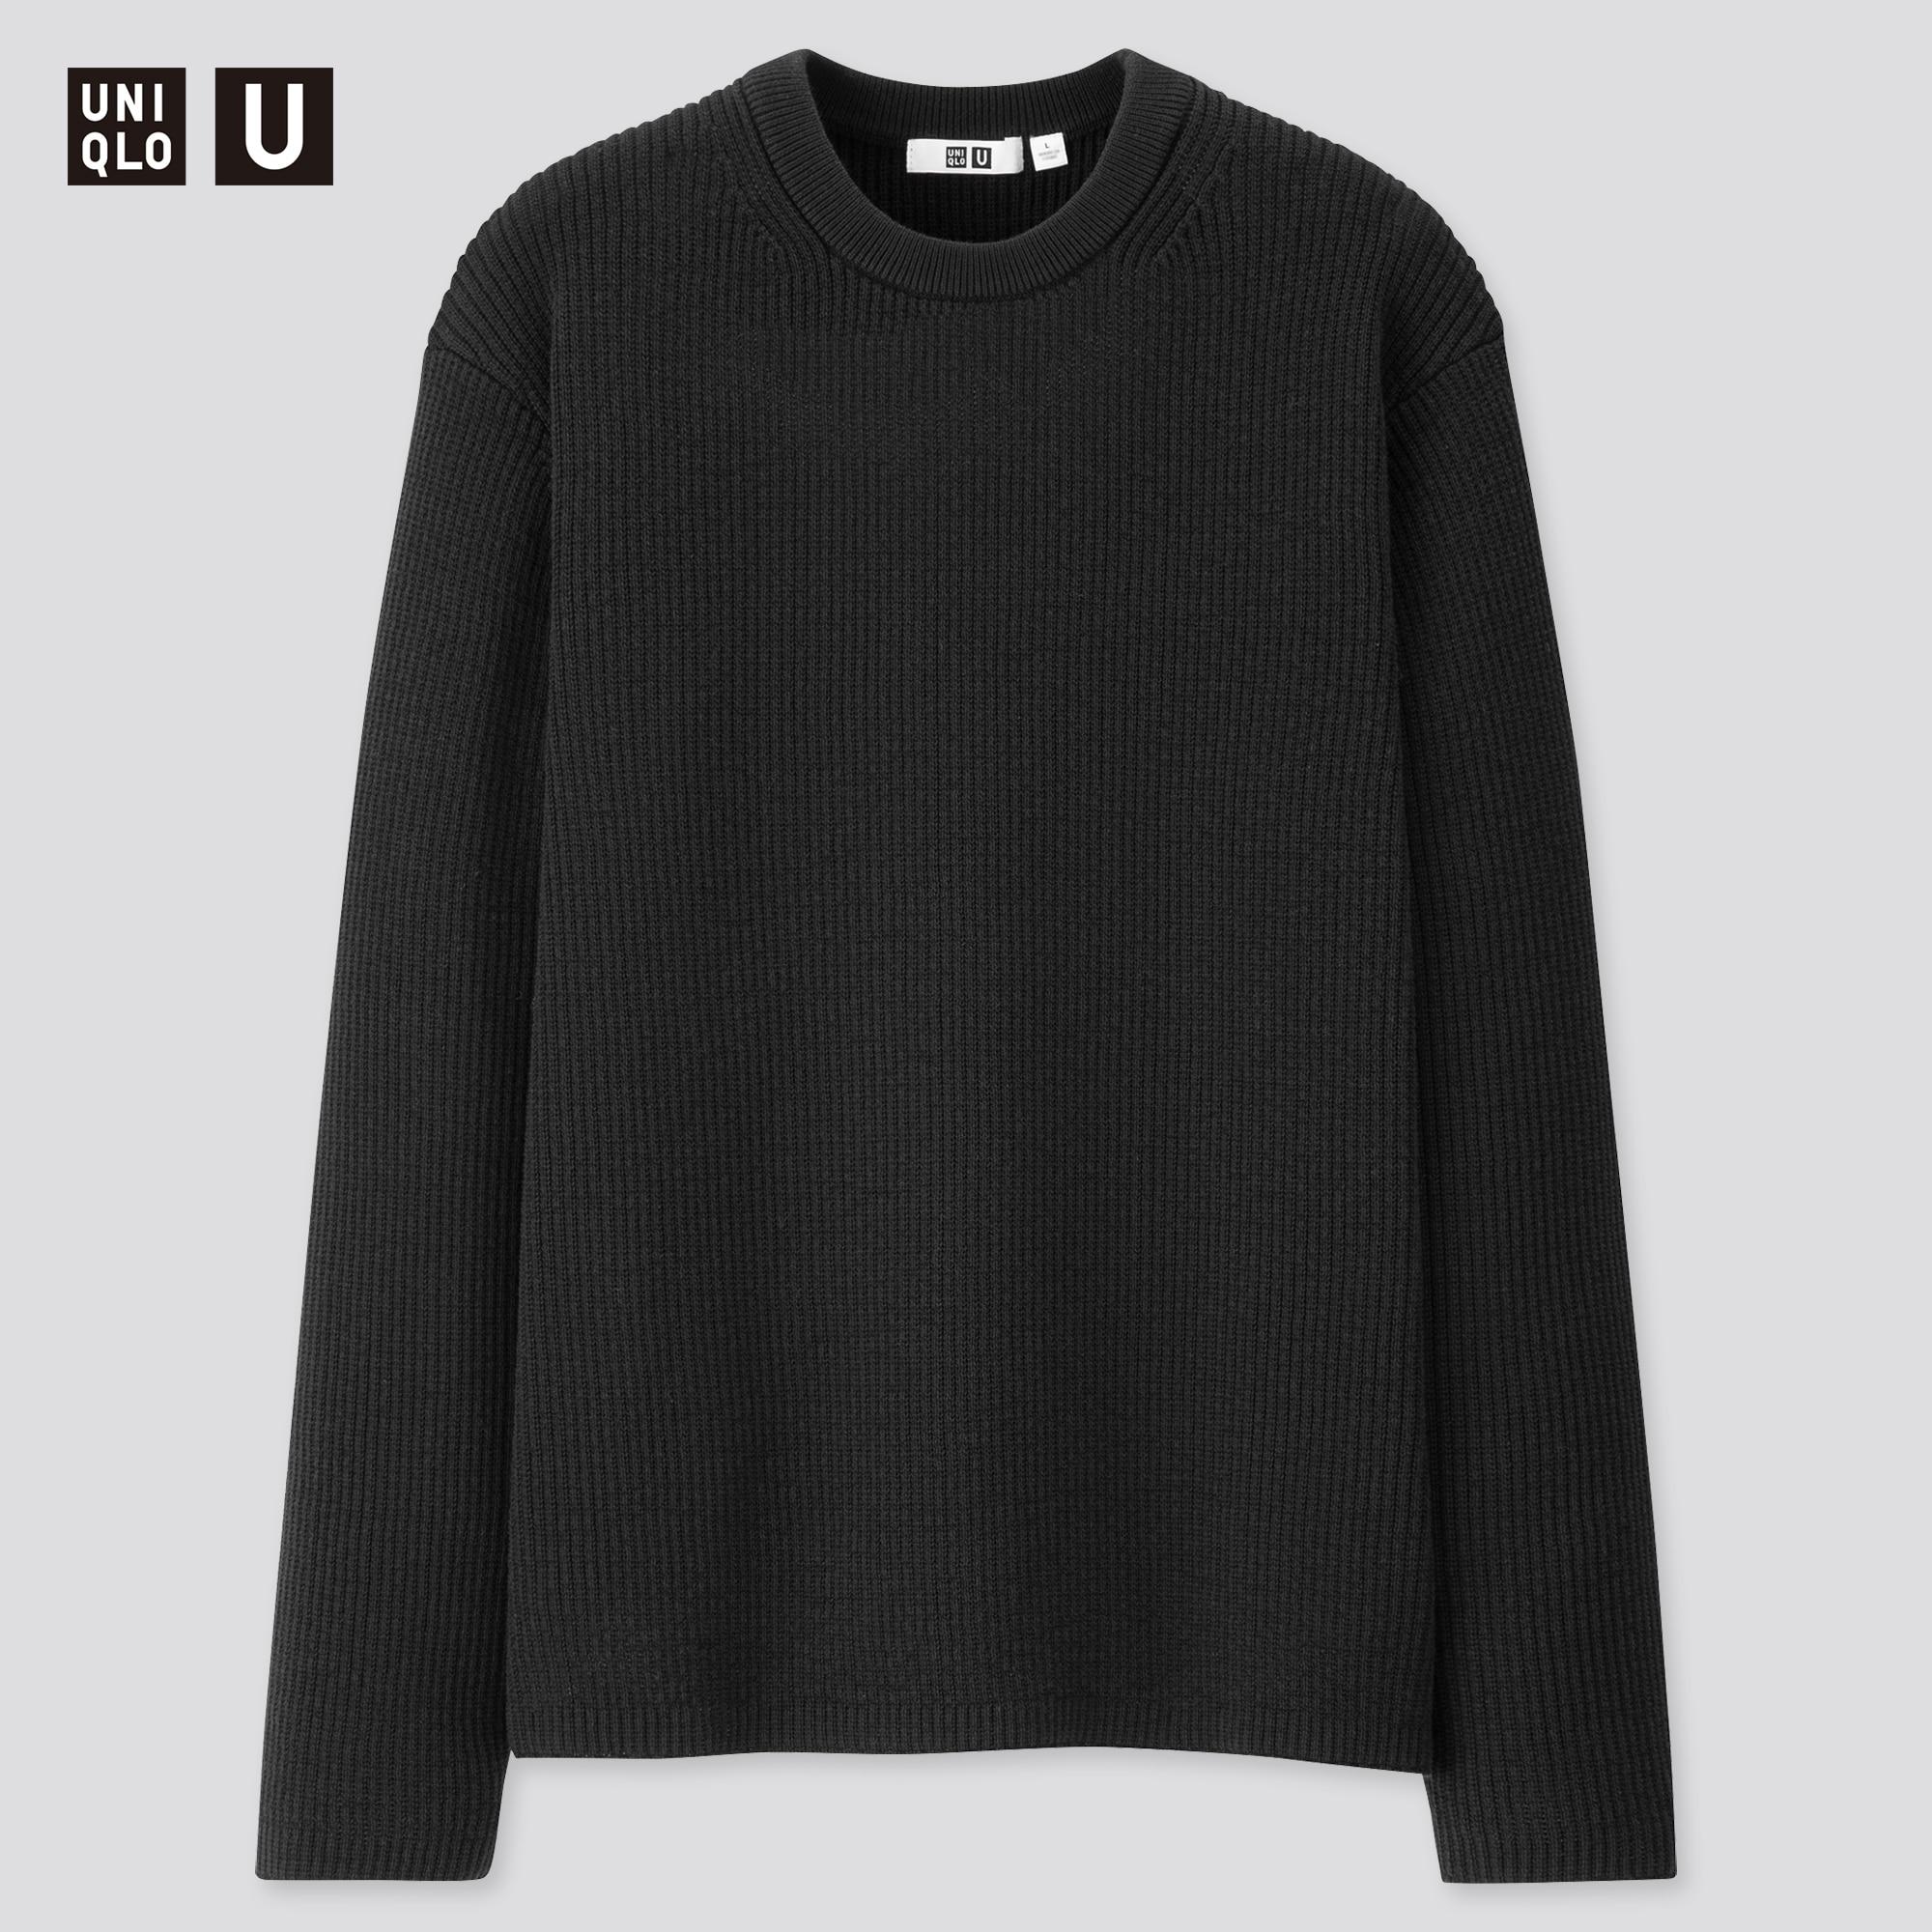 Five Four Mens Round Neck Sweater Fashion Sweatshirts,Natural Graphic